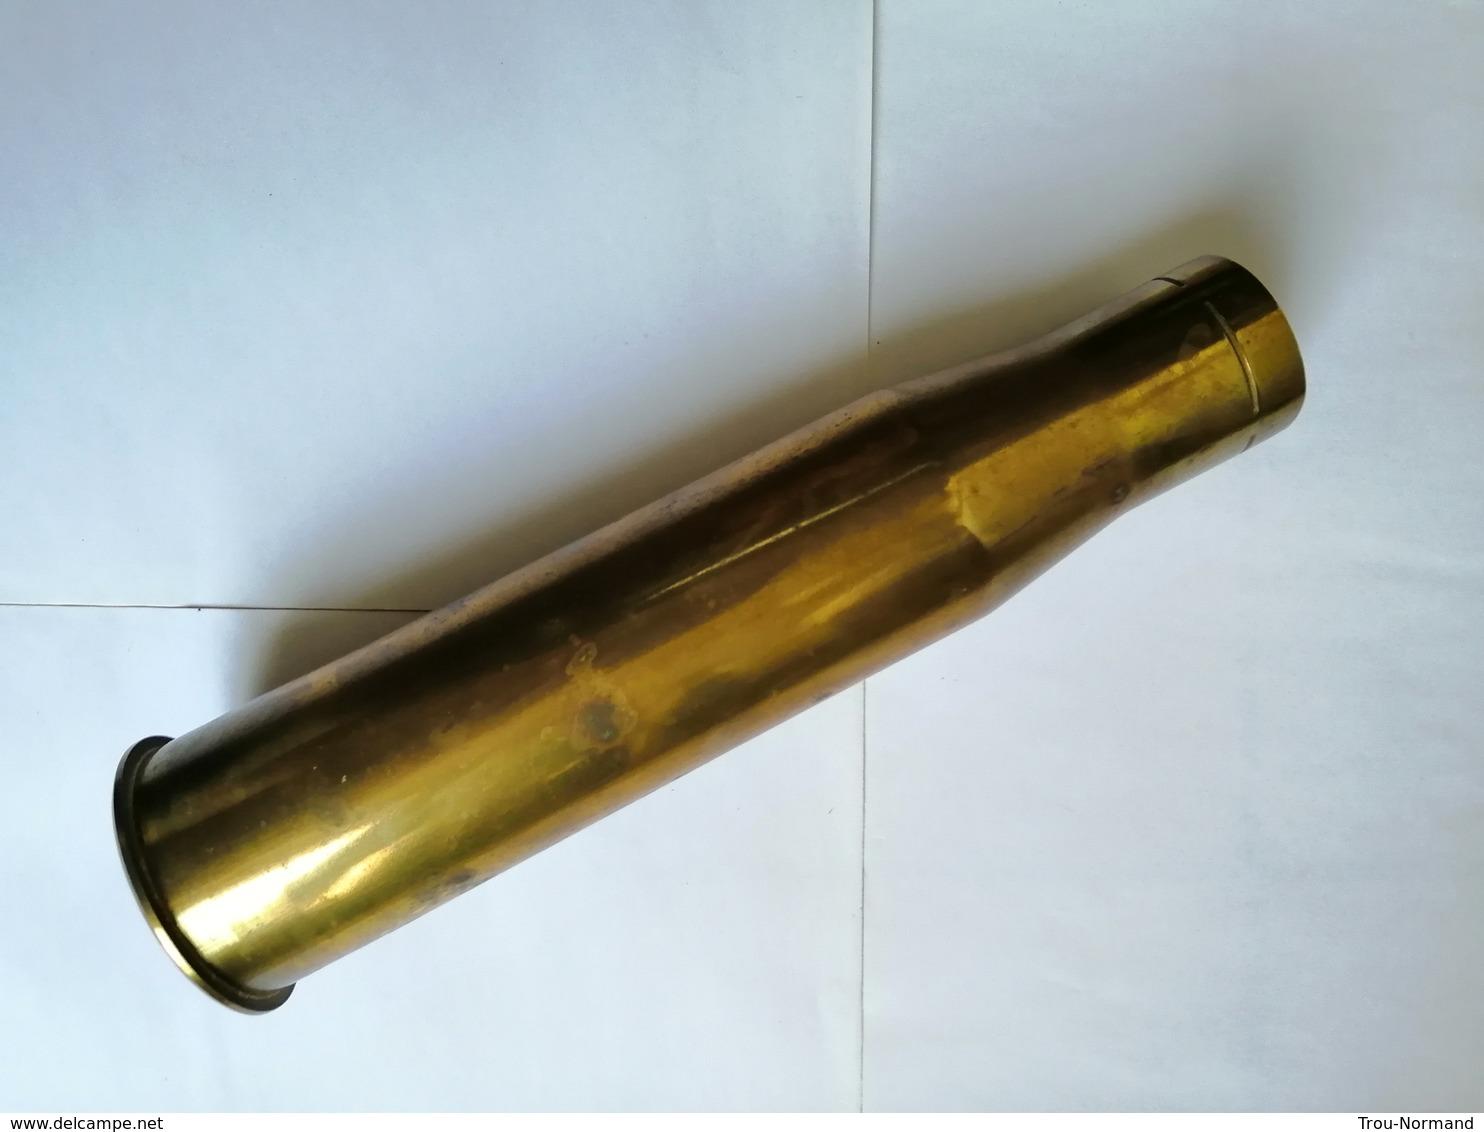 Douille 37mm US M16 - Decotatieve Wapens